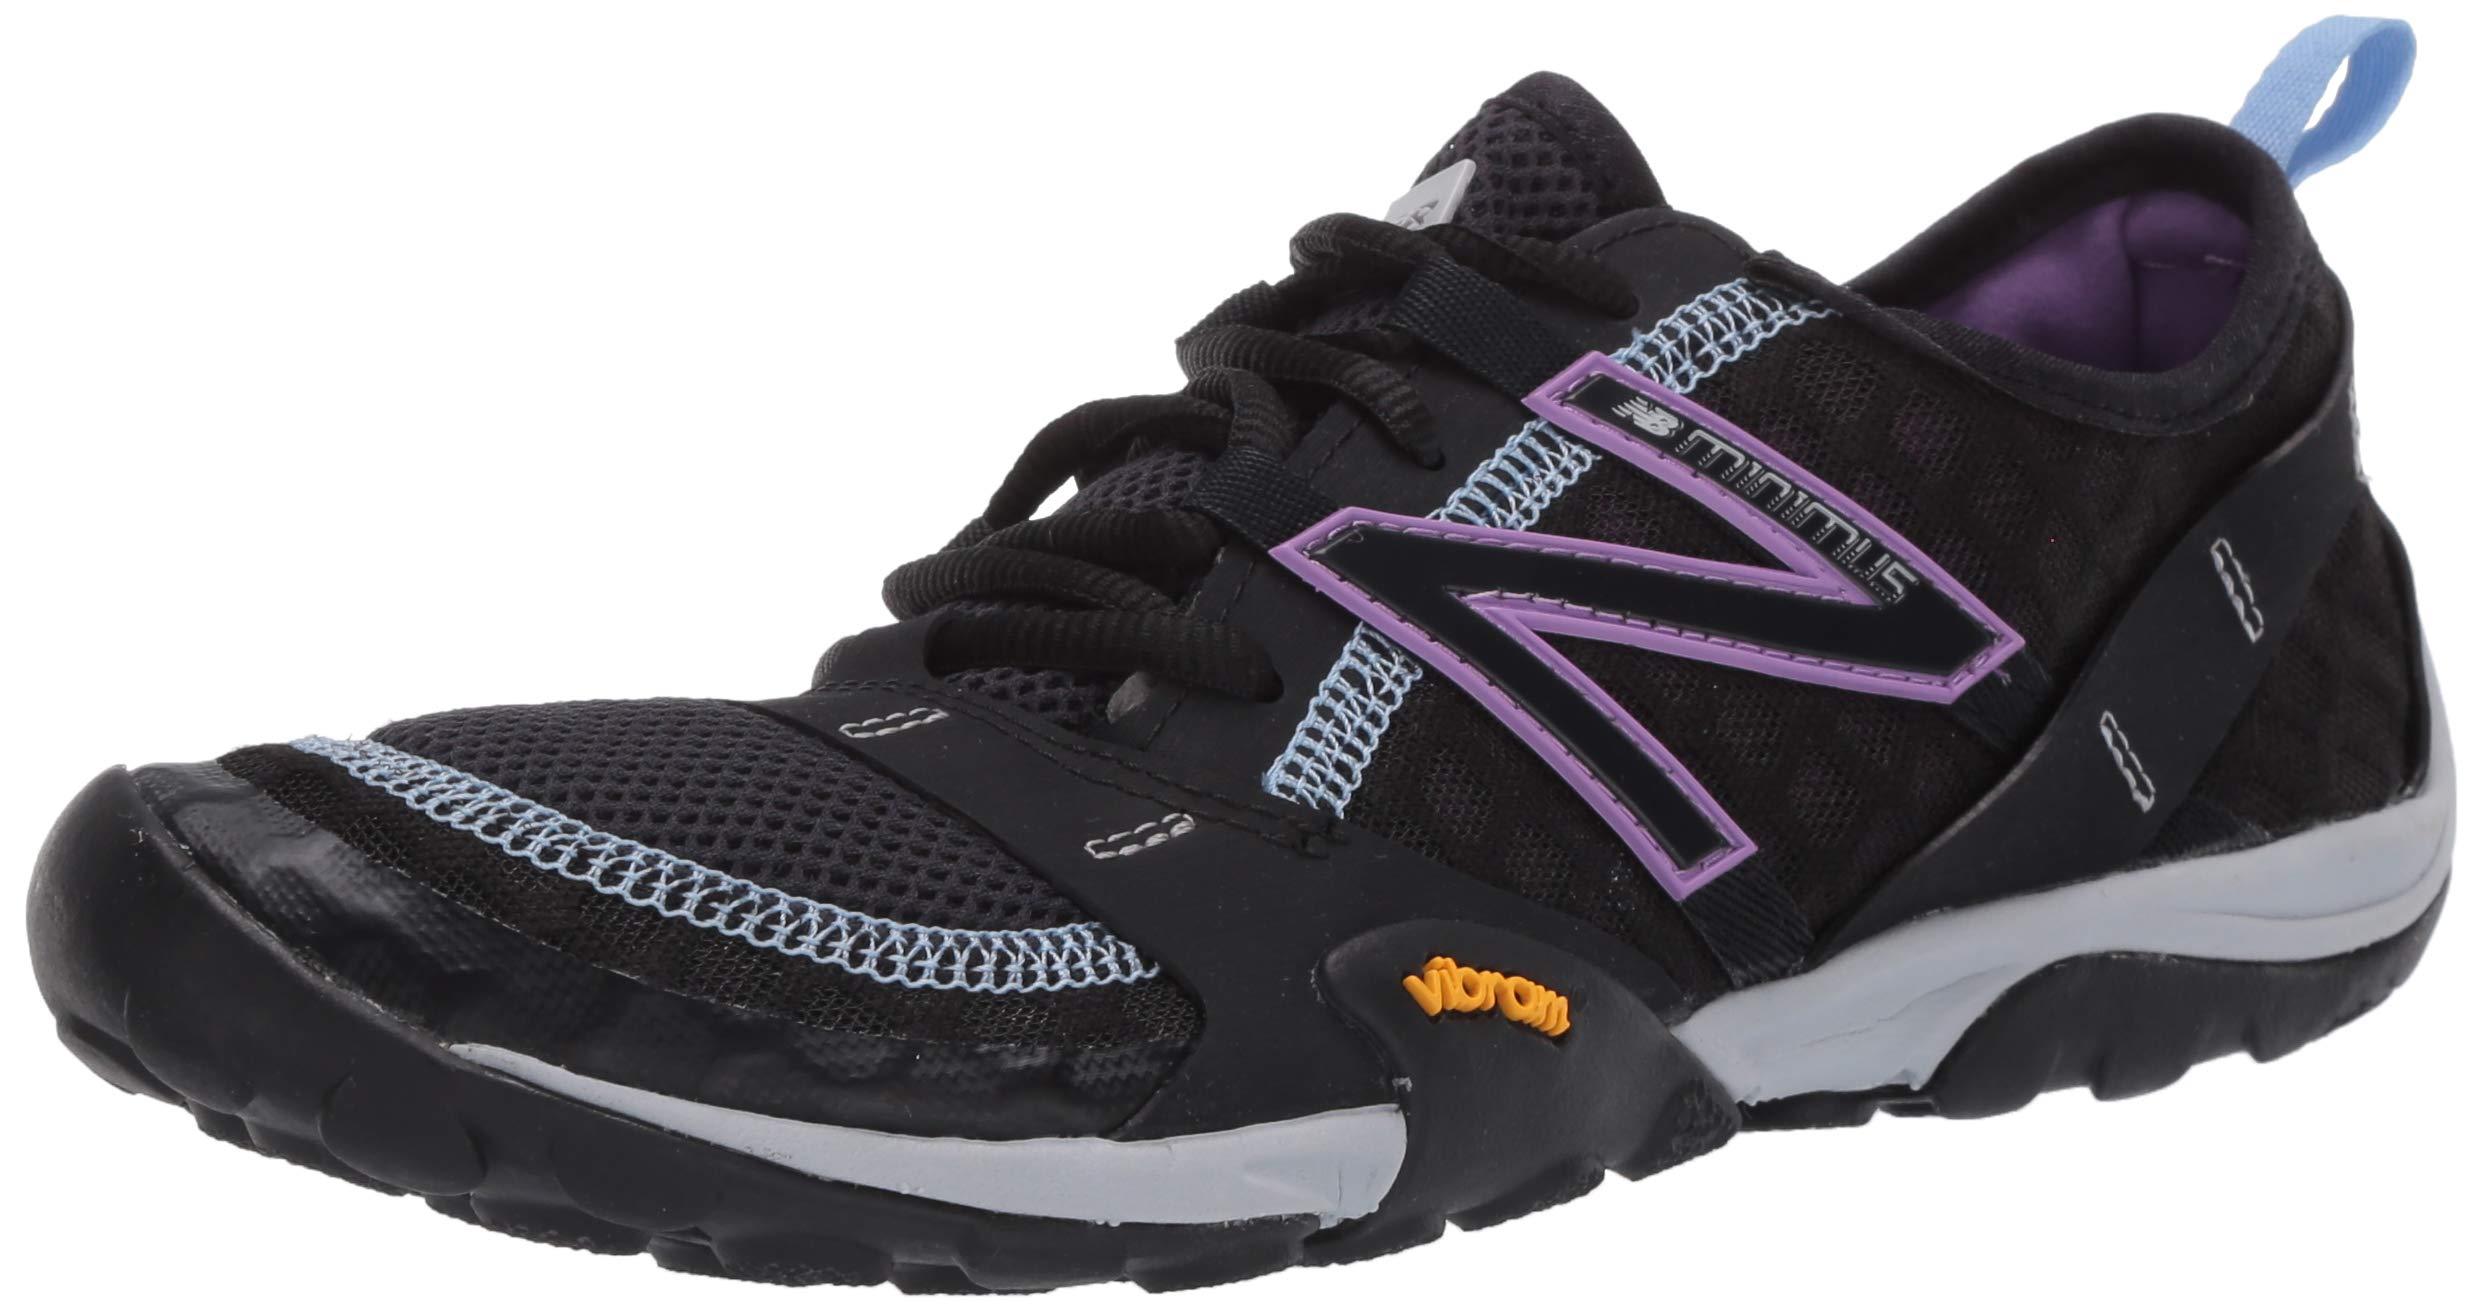 New Balance Women's Minimus 10 V1 Trail Running Shoe